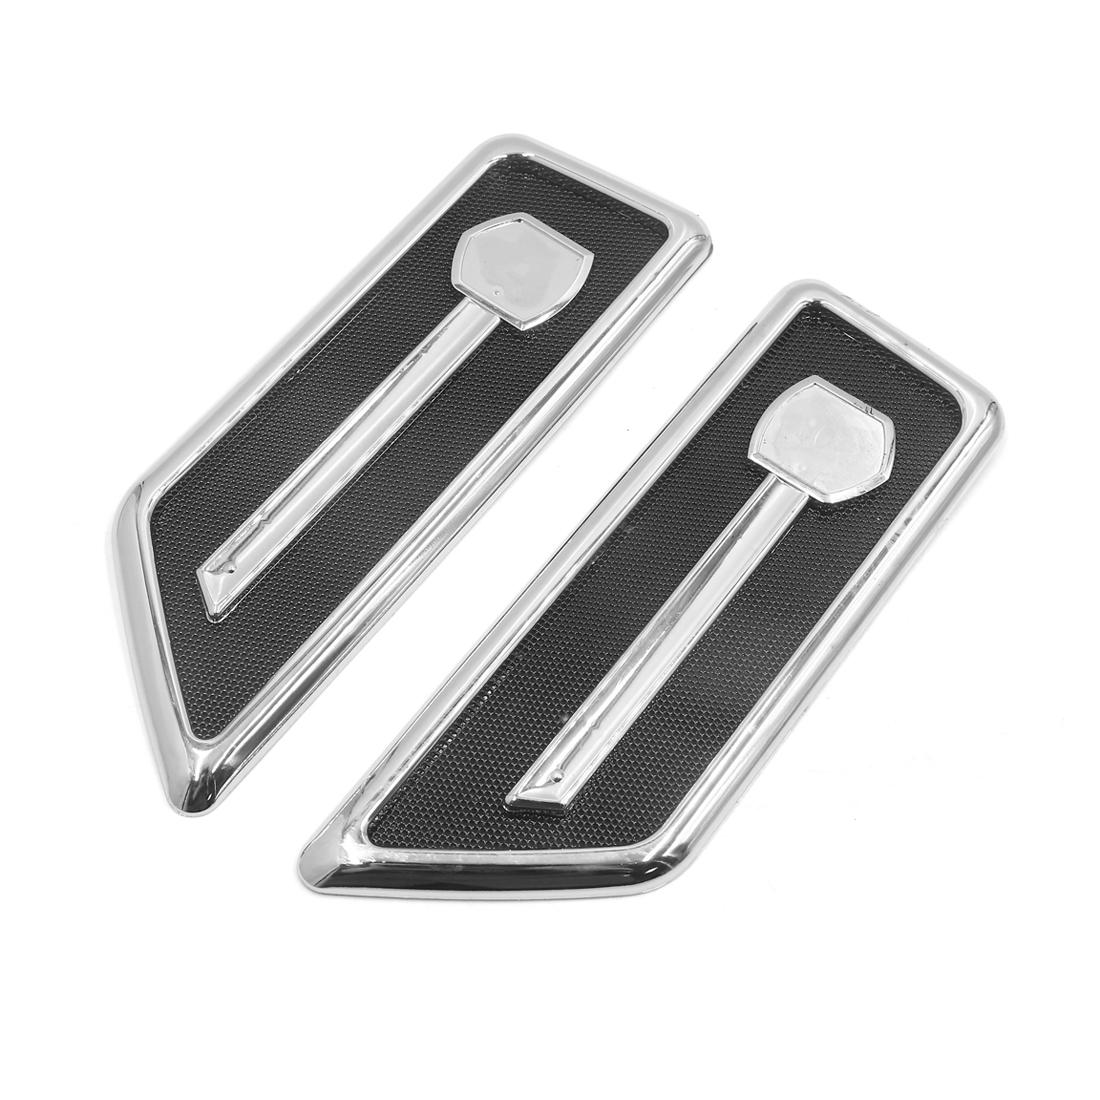 2Pcs Silver Tone Black Adhesive Car Side Fender Vent Air Flow Decoration Sticker